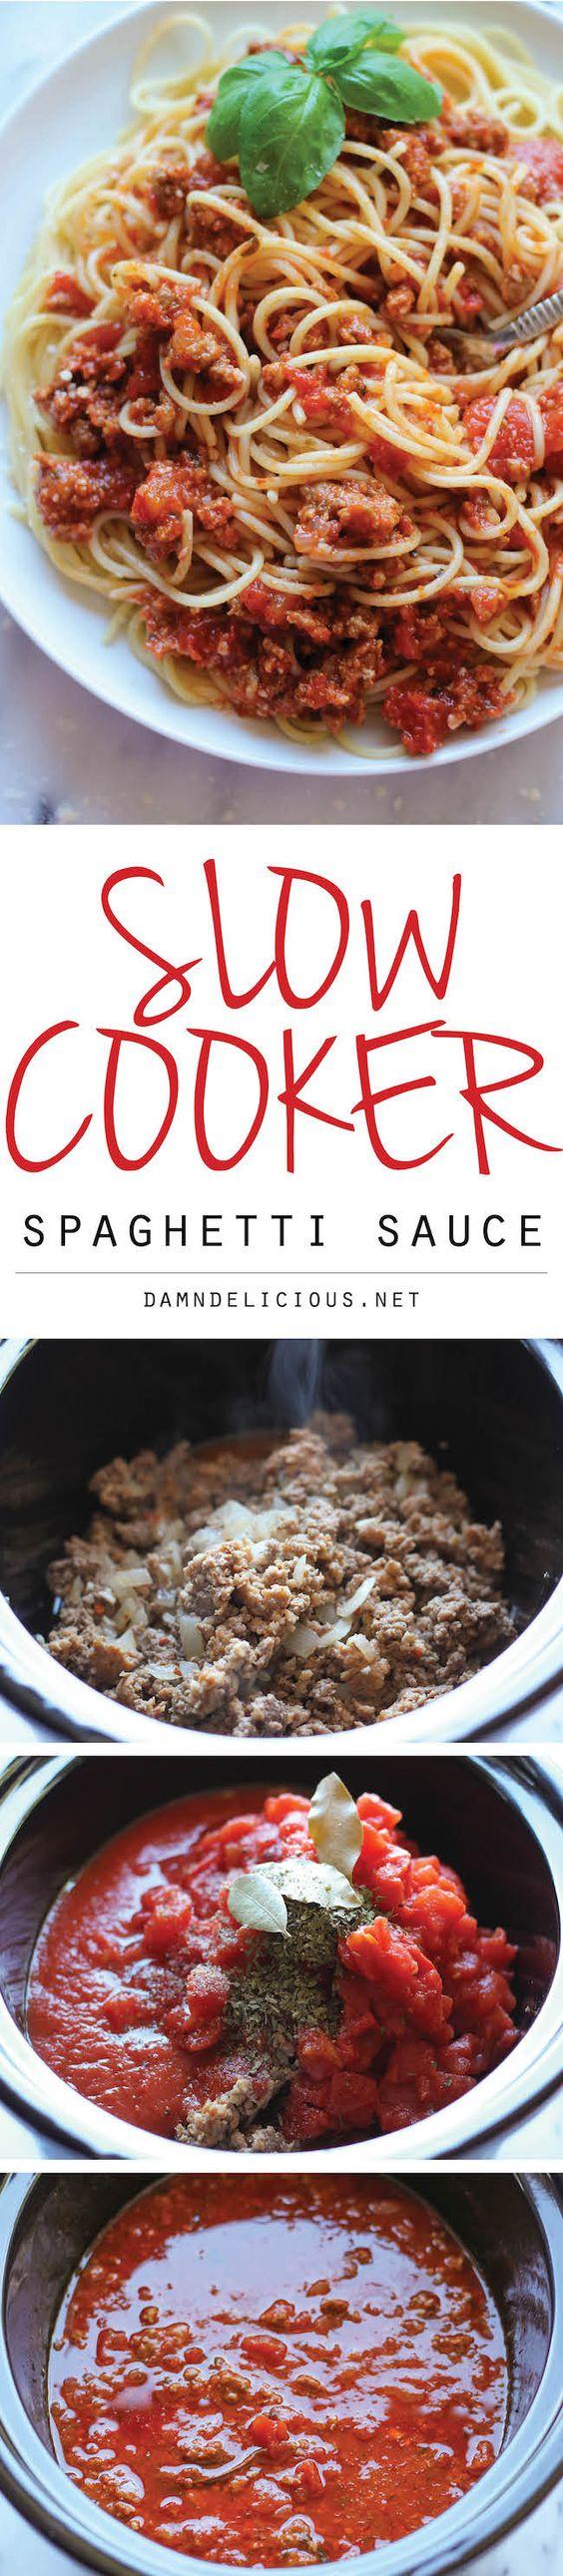 Slow cooker spaghetti, Slow cooker spaghetti sauce and Spaghetti on ...